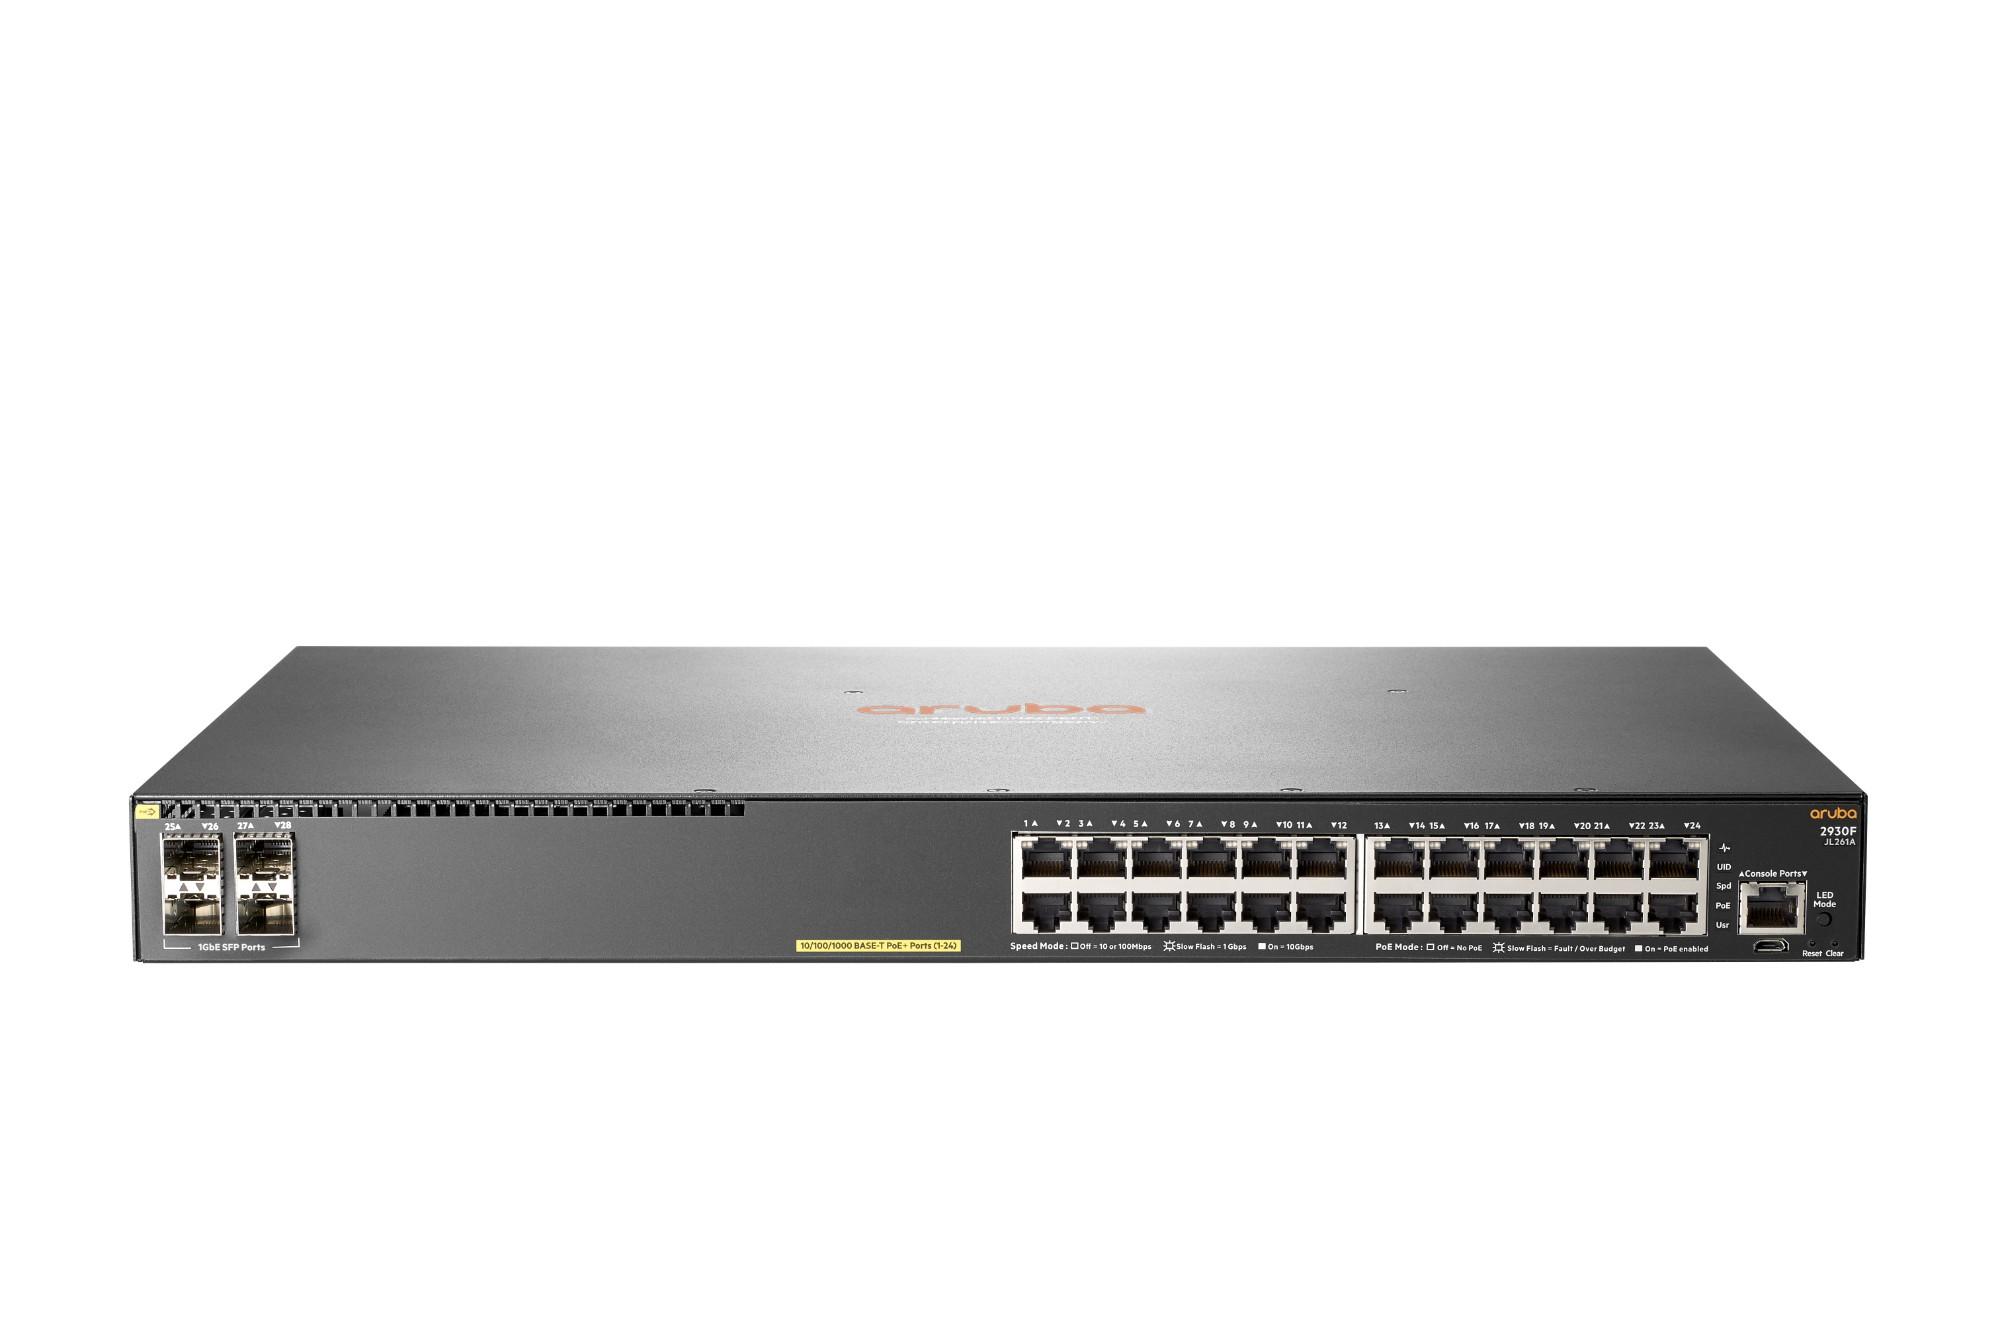 Hewlett Packard Enterprise Aruba 2930F 24G PoE+ 4SFP Managed L3 Gigabit Ethernet (10/100/1000) Grey 1U Power over Ethernet (PoE)